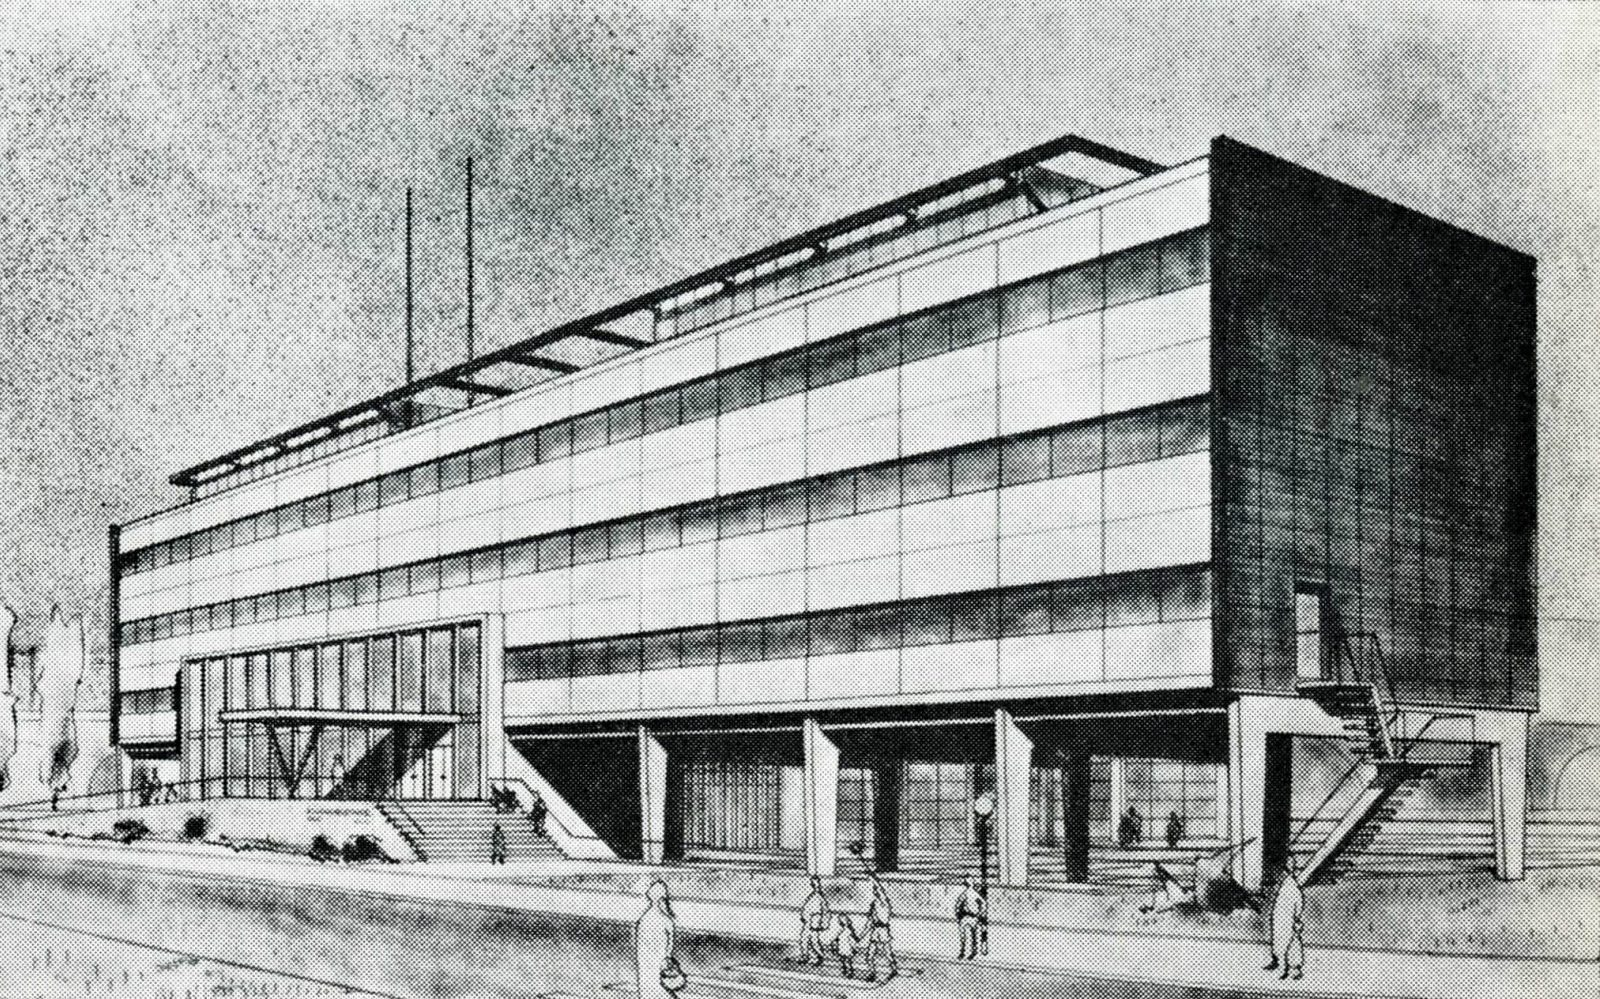 Keucheniusschool-1-Maasstad-1958-7-8-p.197